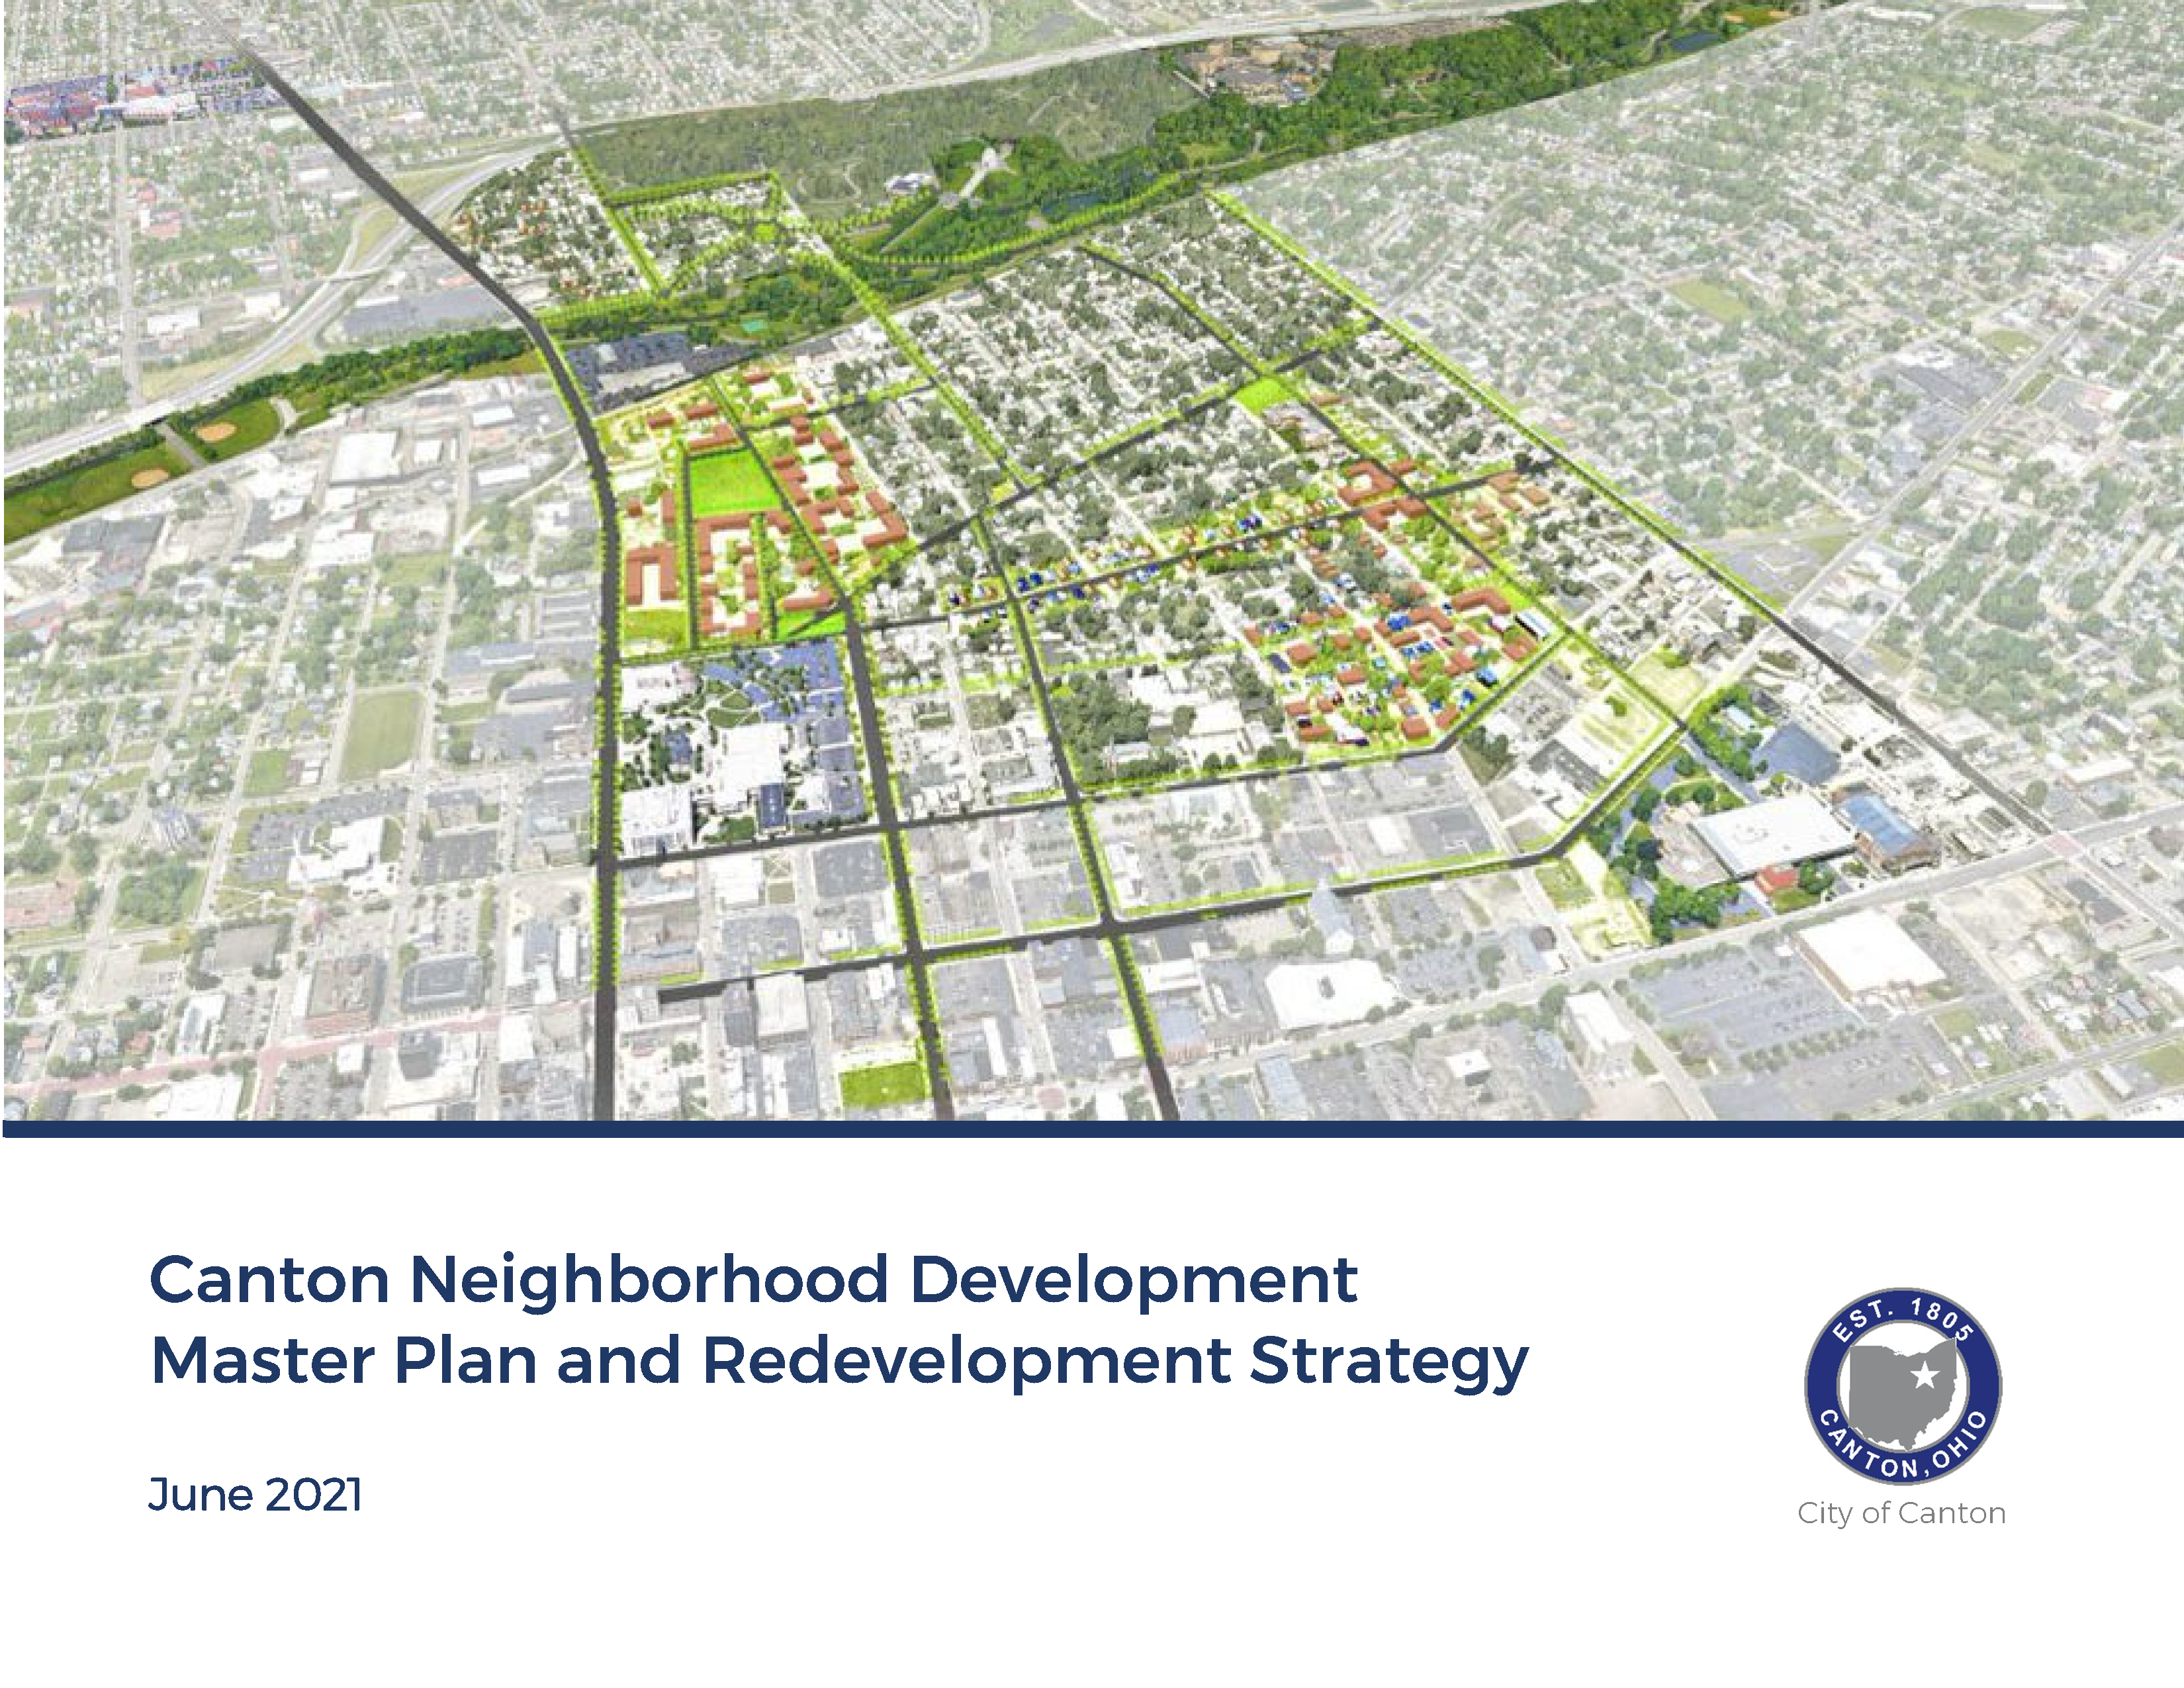 Cover - 2021 Canton Neighborhood Plan Opens in new window